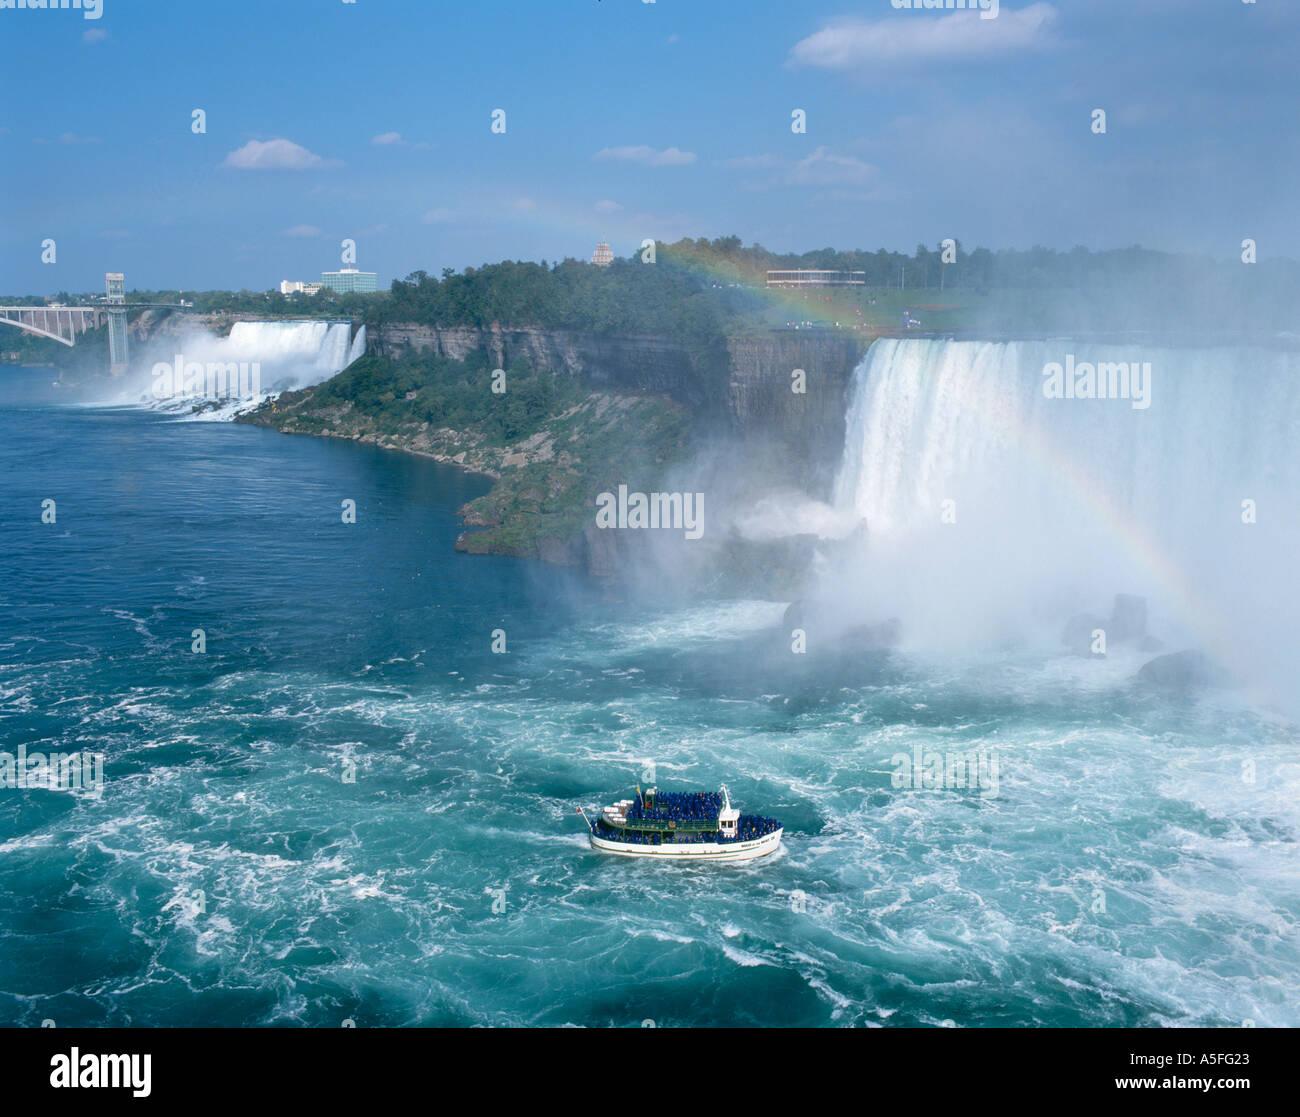 Mädchen des Nebels Kreuzfahrtschiff, Niagara Falls, Ontario, Kanada Stockbild